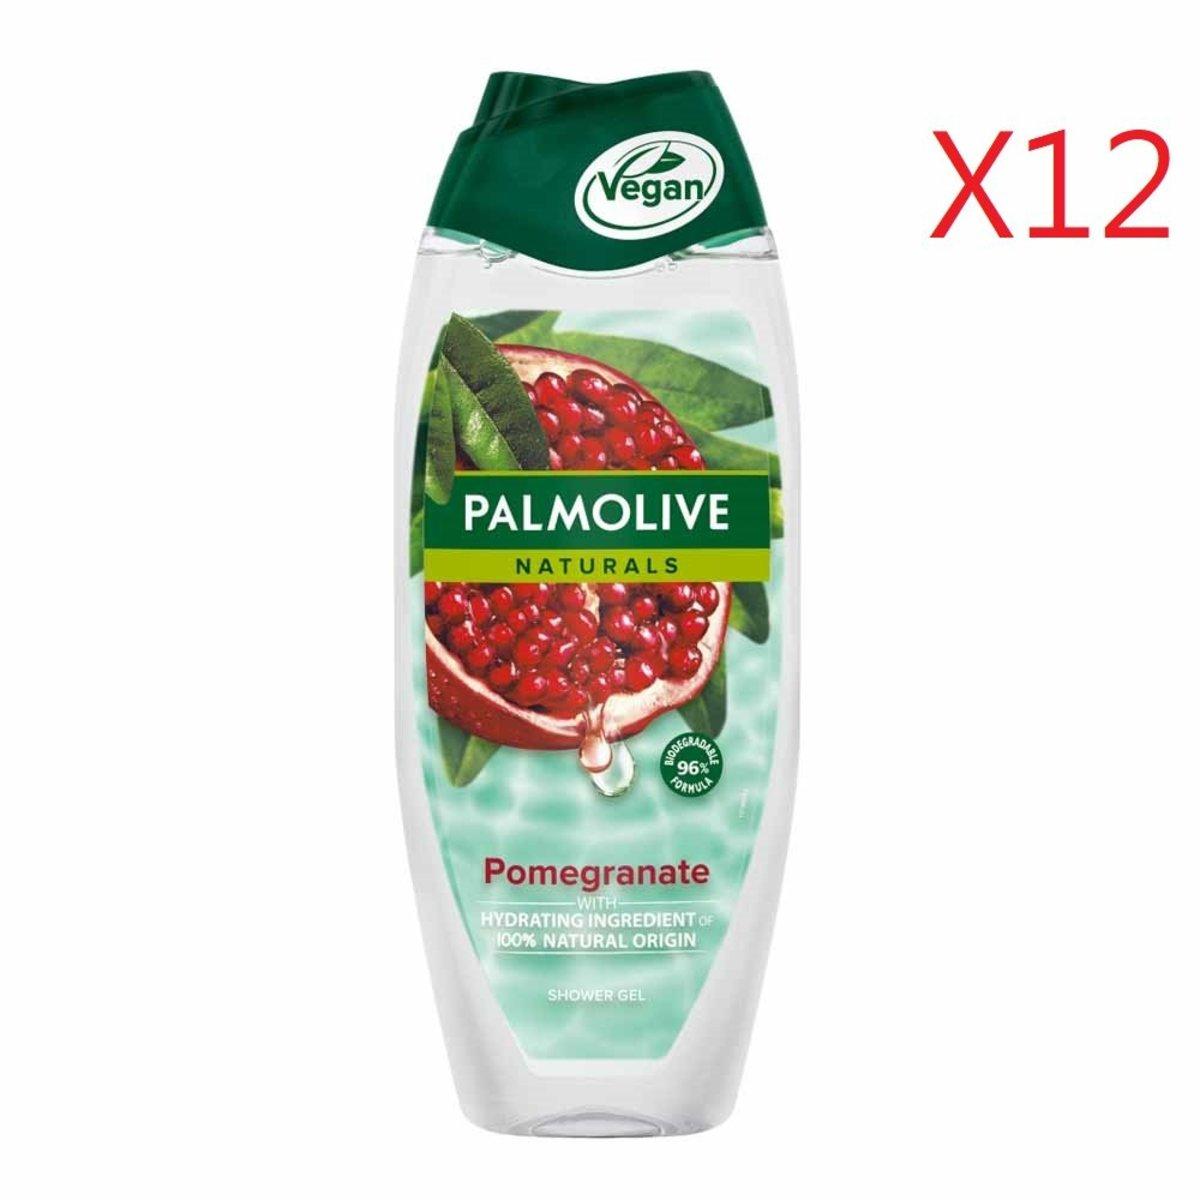 100% Natural Origin Shower Gel 500ml - Pomegranate X 12pcs [Parallel Import Product]